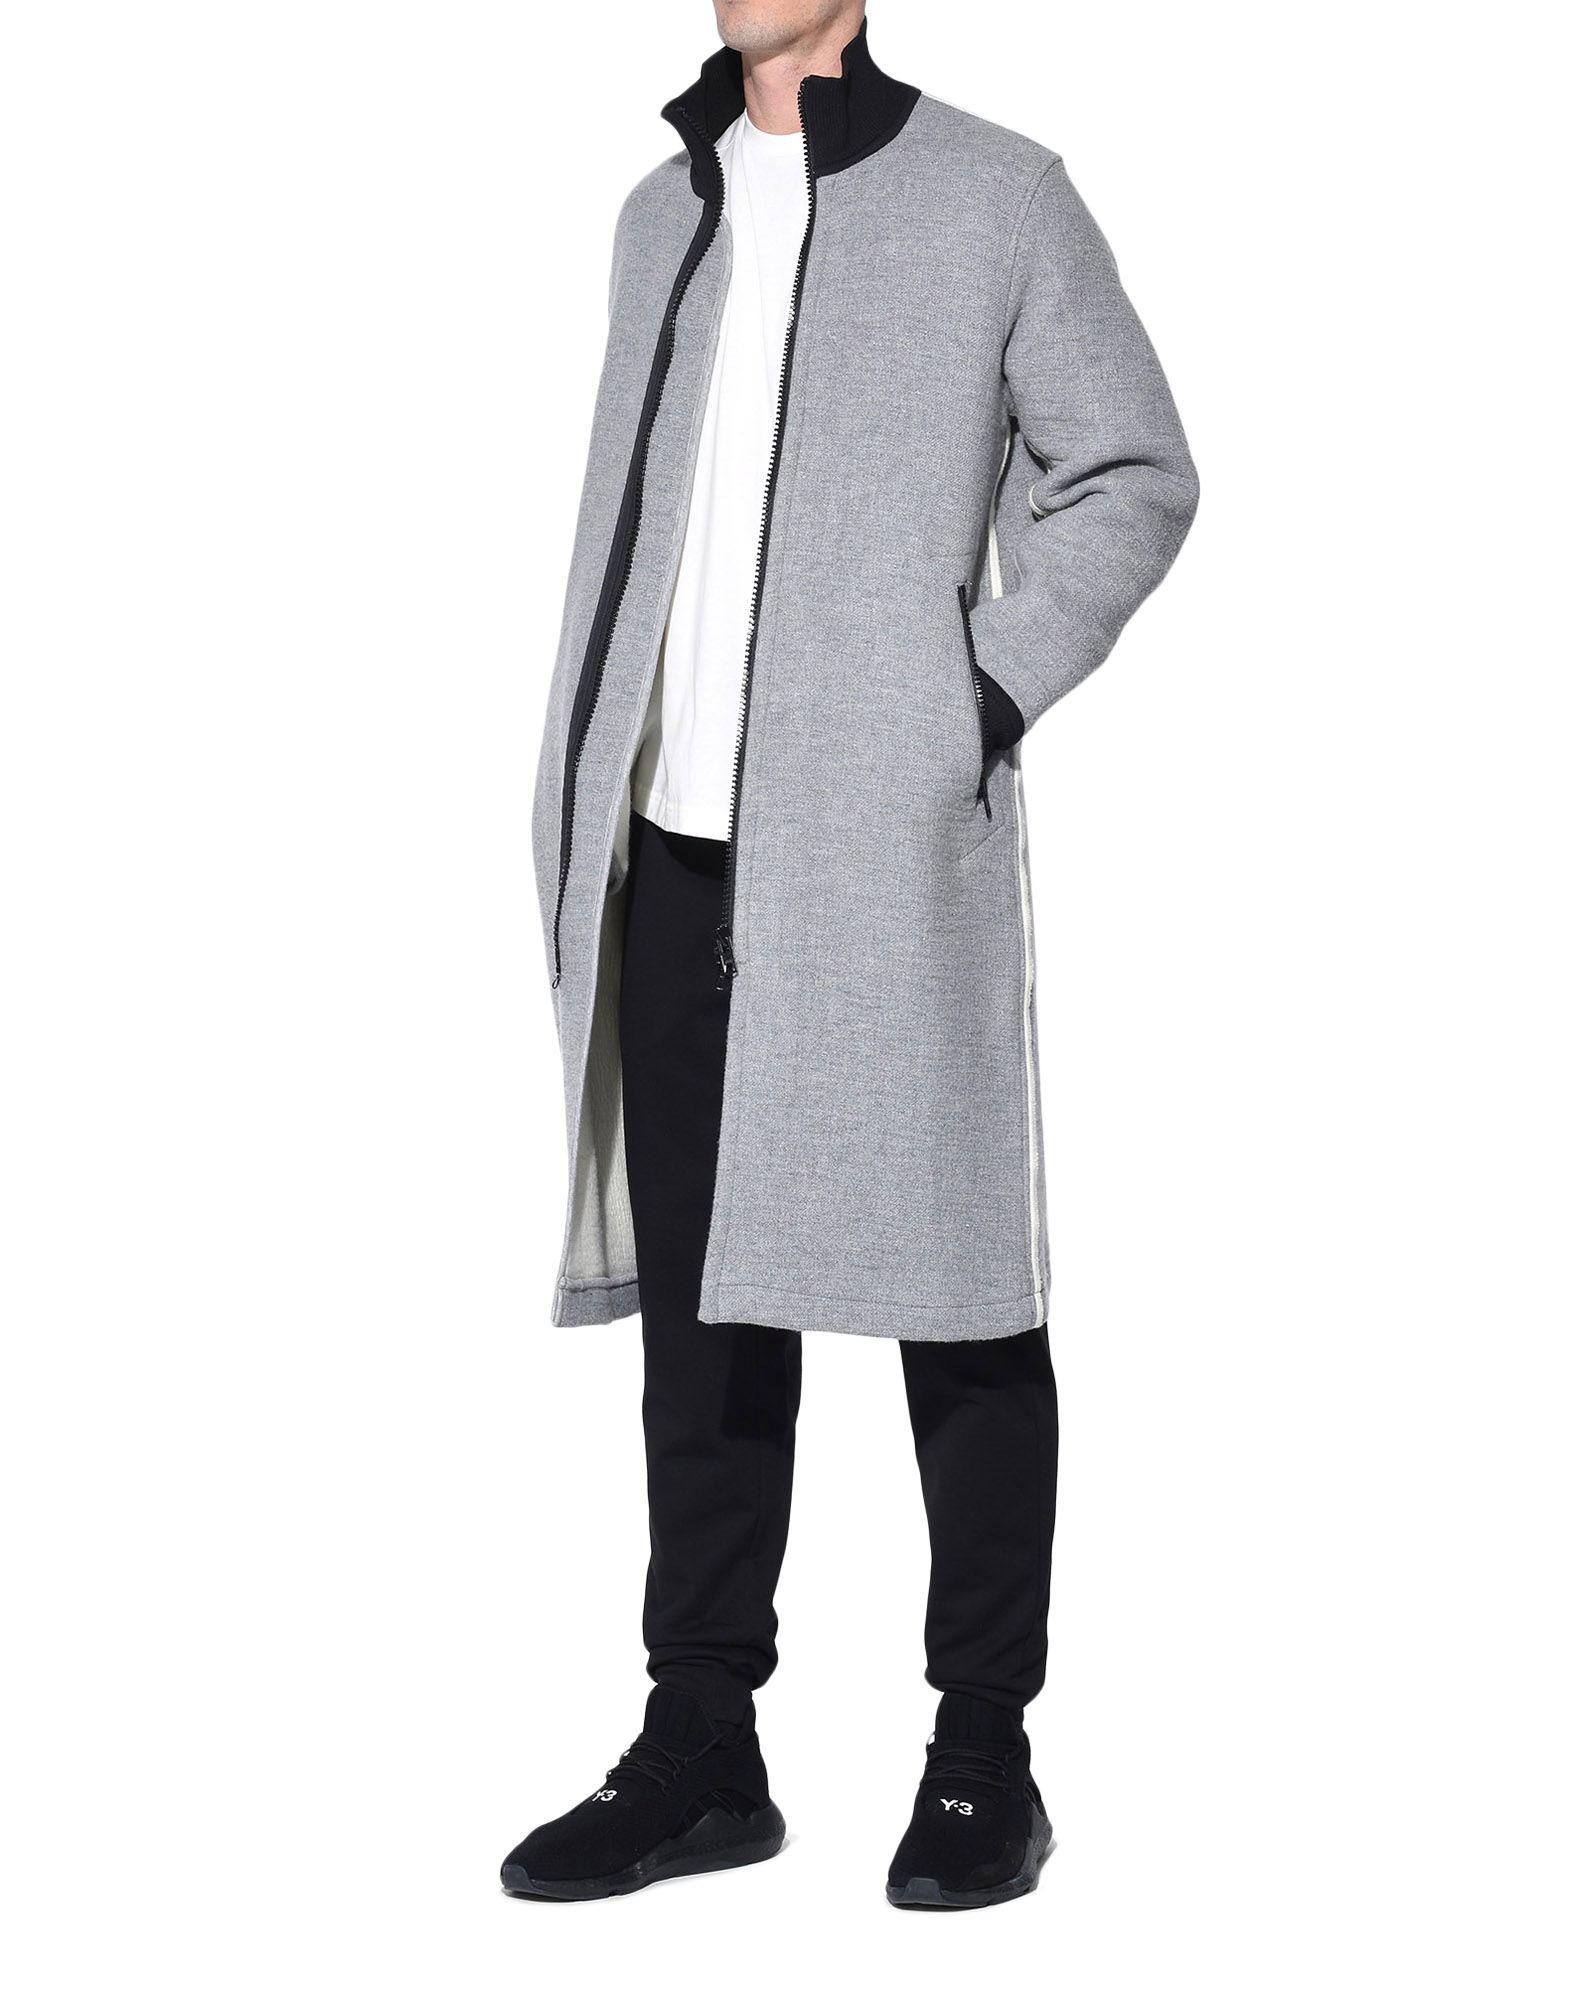 Y-3 Y-3 Spacer Wool Coat Coat Man a